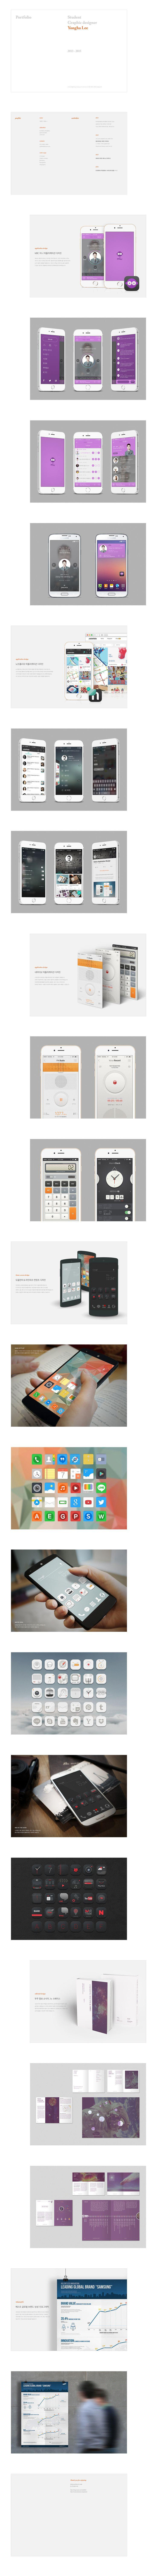 Portfolio for web : Graphic designer Yongha Lee This portfolio has 7works that I designed for 3 years, 2013 - 2015.It consists of UI, Typography and Infographic works.   -   웹포트폴리오 : 그래픽 디자이너 이용하 2013년부터 2015년까지의 개인작품으로 제작한 웹 포트폴리오입니다.UI, 타이포그래피, 인포그래픽 등 총 7작품, 24페이지로 구성되어 있습니다.  Copyright 2015. Yongha Lee all rights reserved.